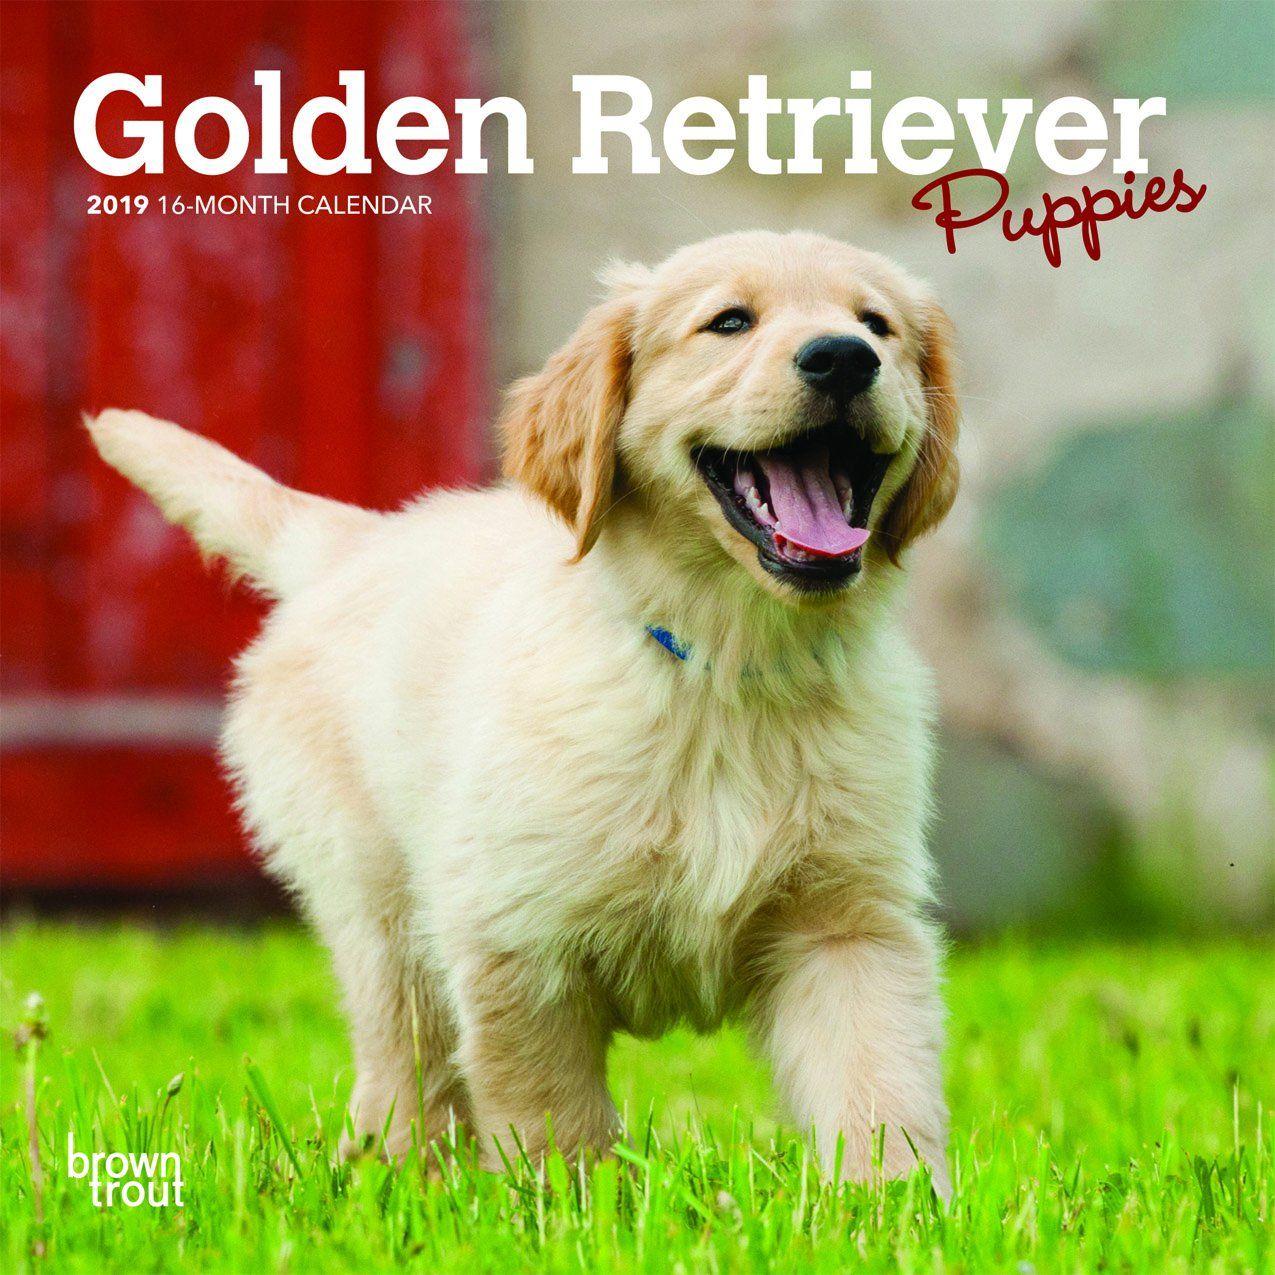 Golden Retriever Puppies 2019 Mini Wall Calendar Puppies Dog